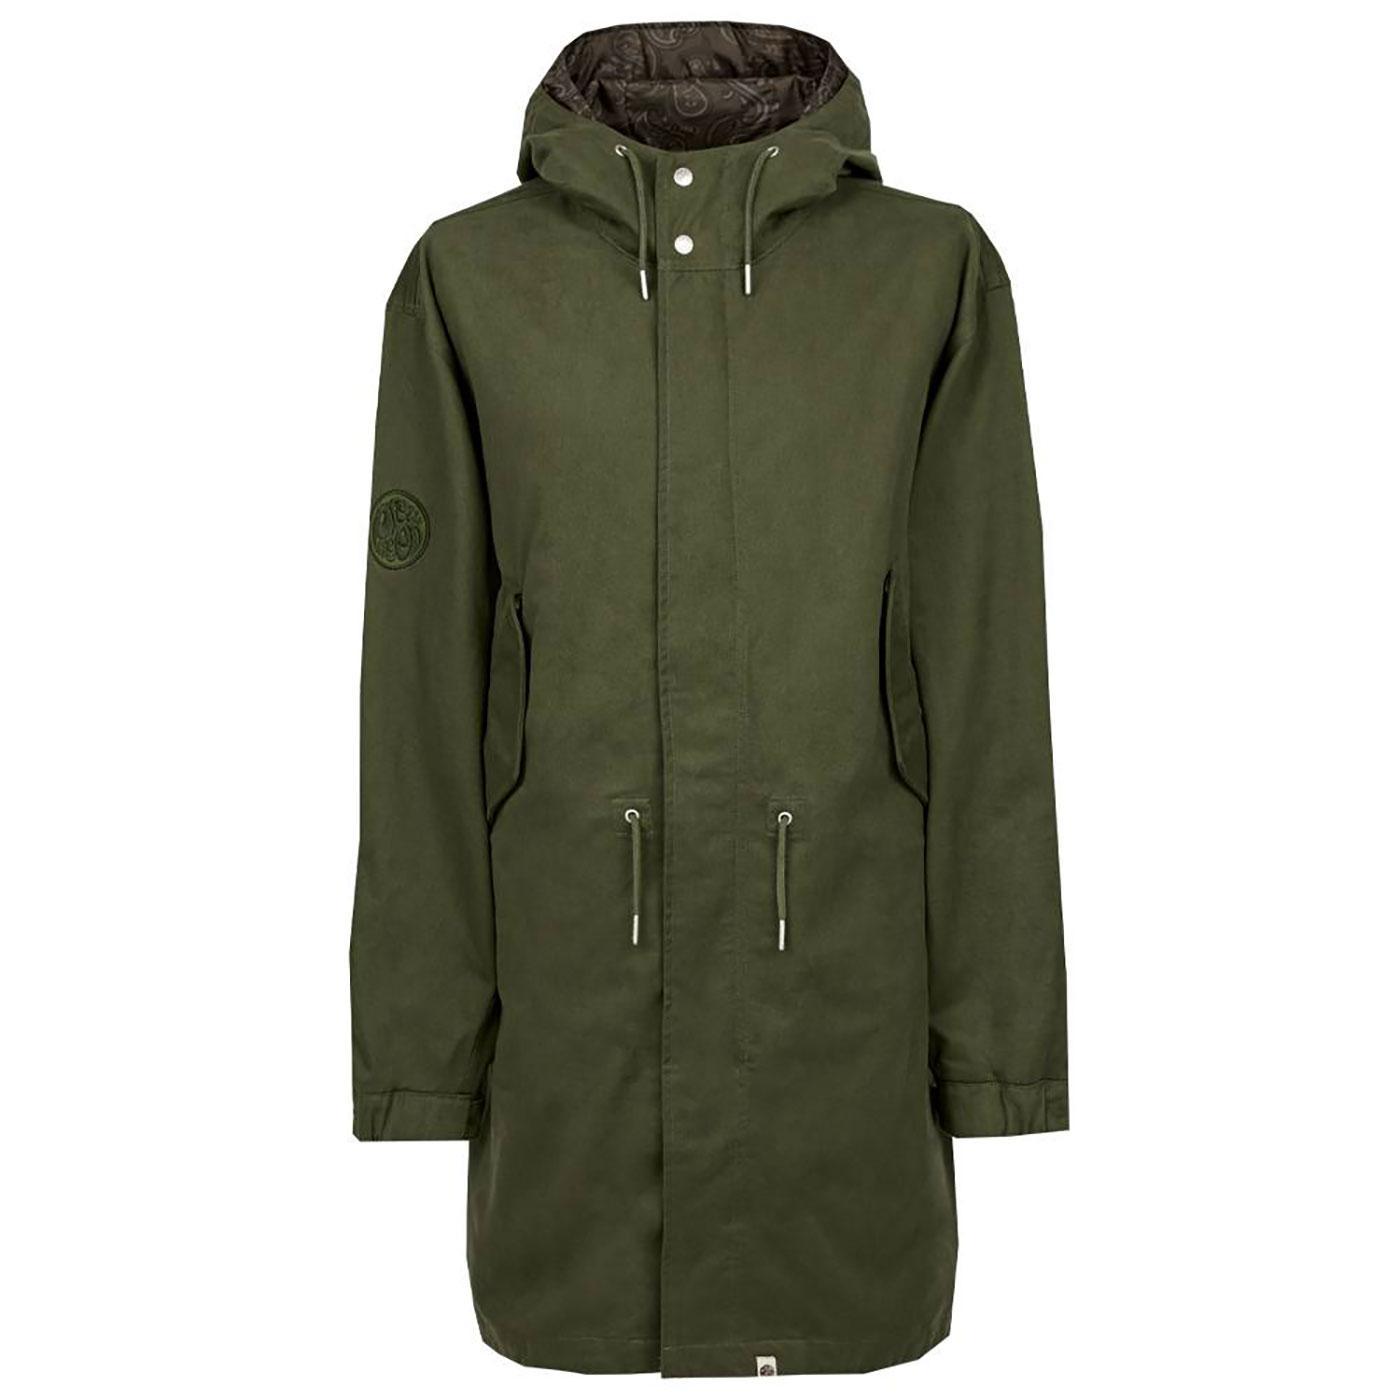 PRETTY GREEN Retro Mod Cotton Hooded Parka Jacket